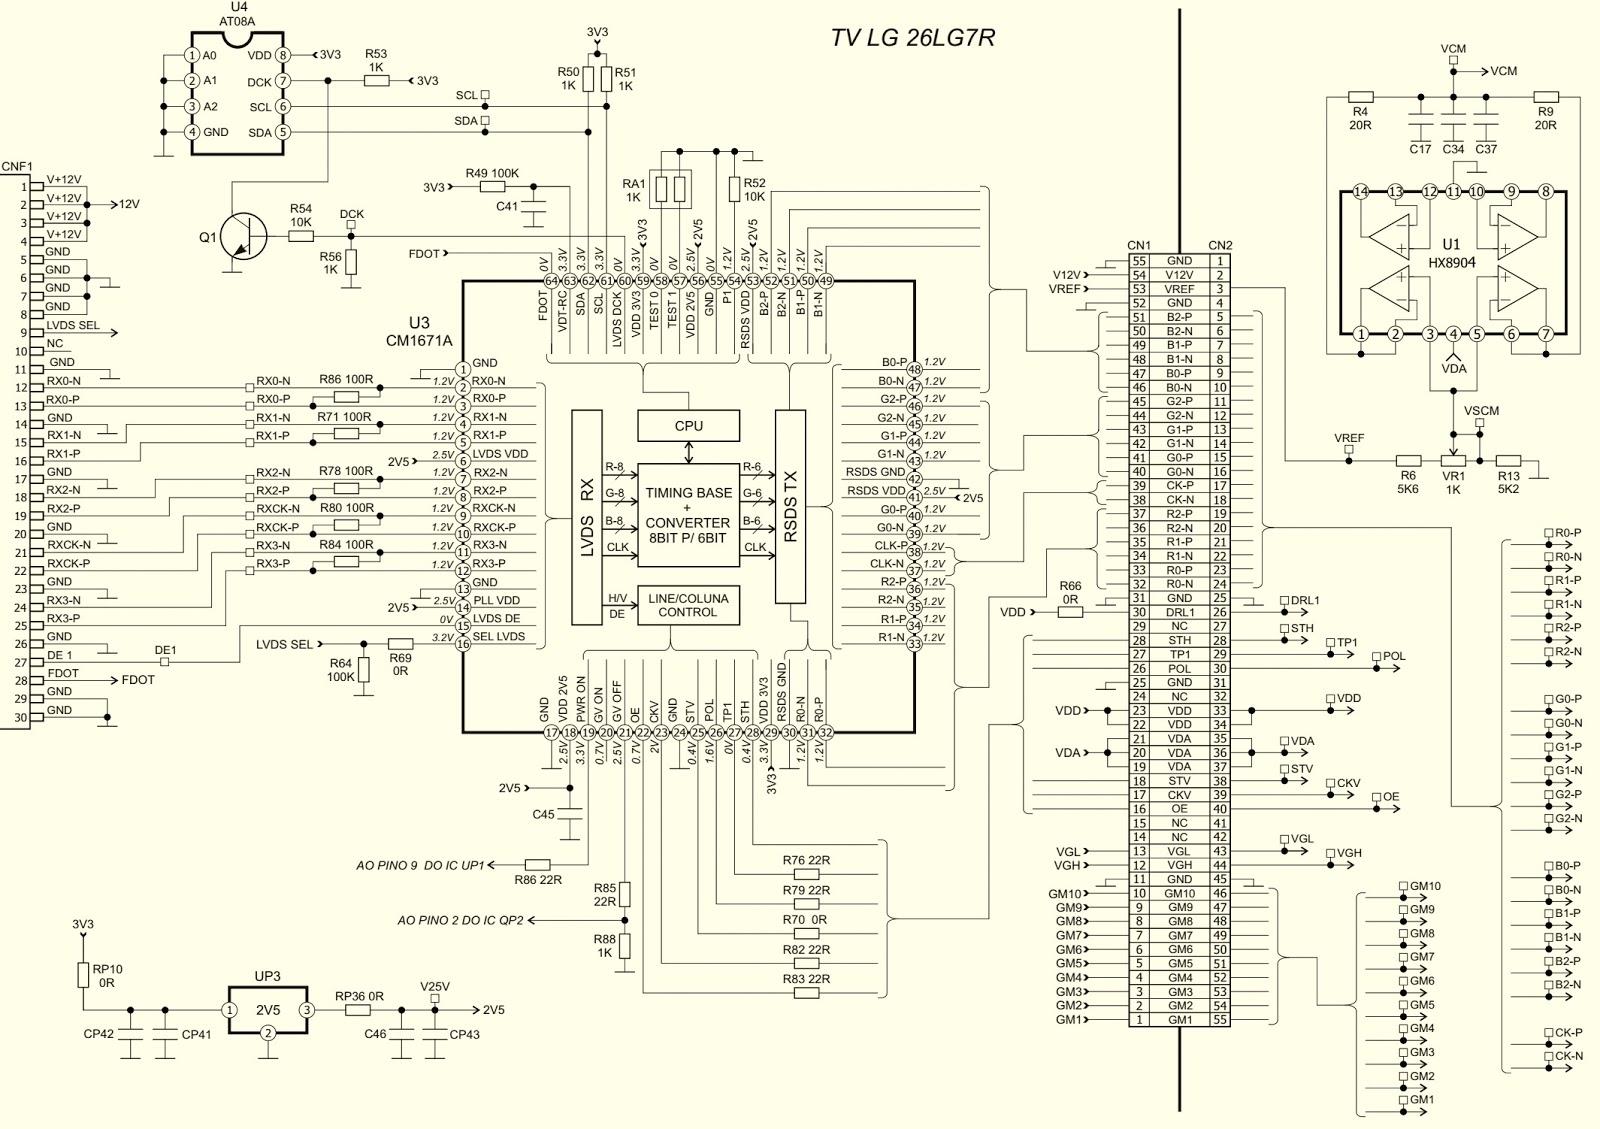 Terrific Lg Tv Circuit Board Diagram Diagram Data Schema Wiring Cloud Inklaidewilluminateatxorg